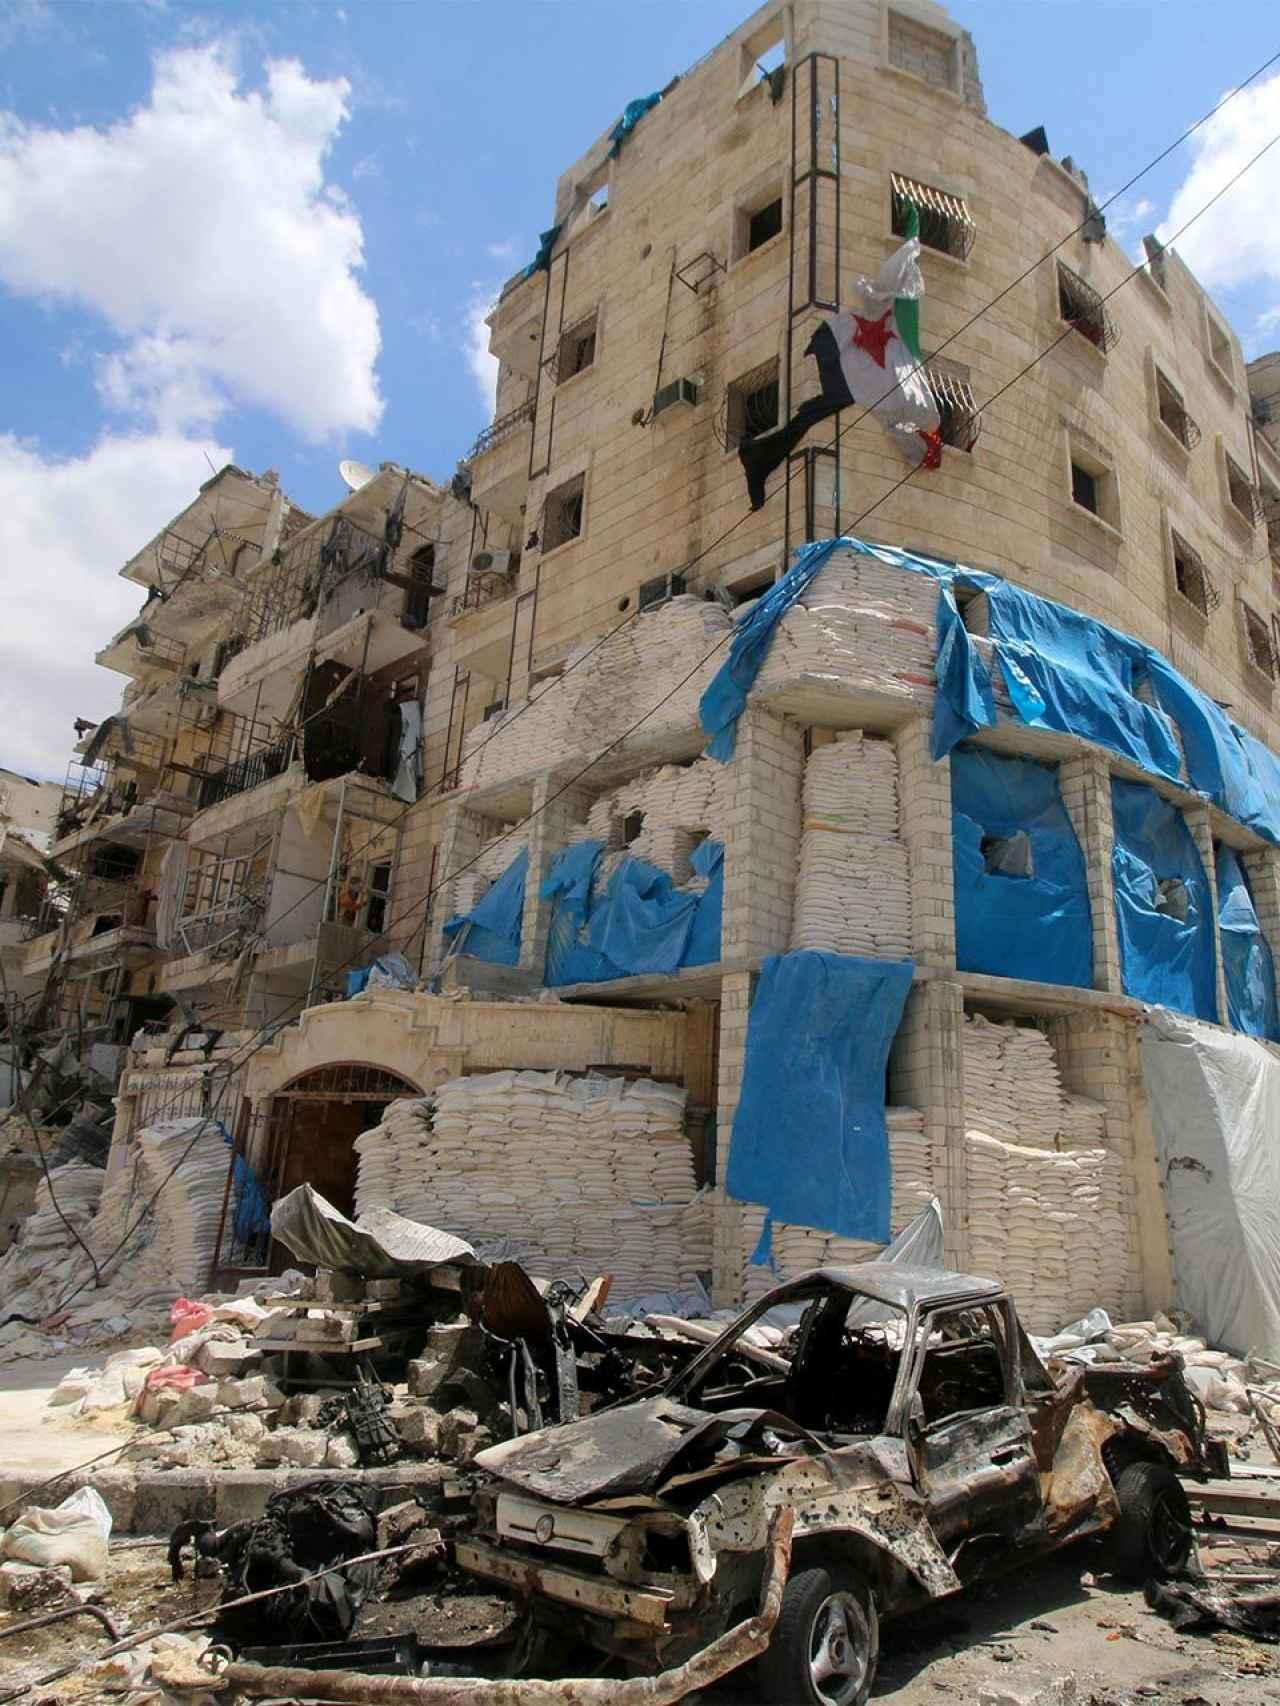 Hospital de Al Quds, en el que murió el doctor Maaz, después del bombardeo.